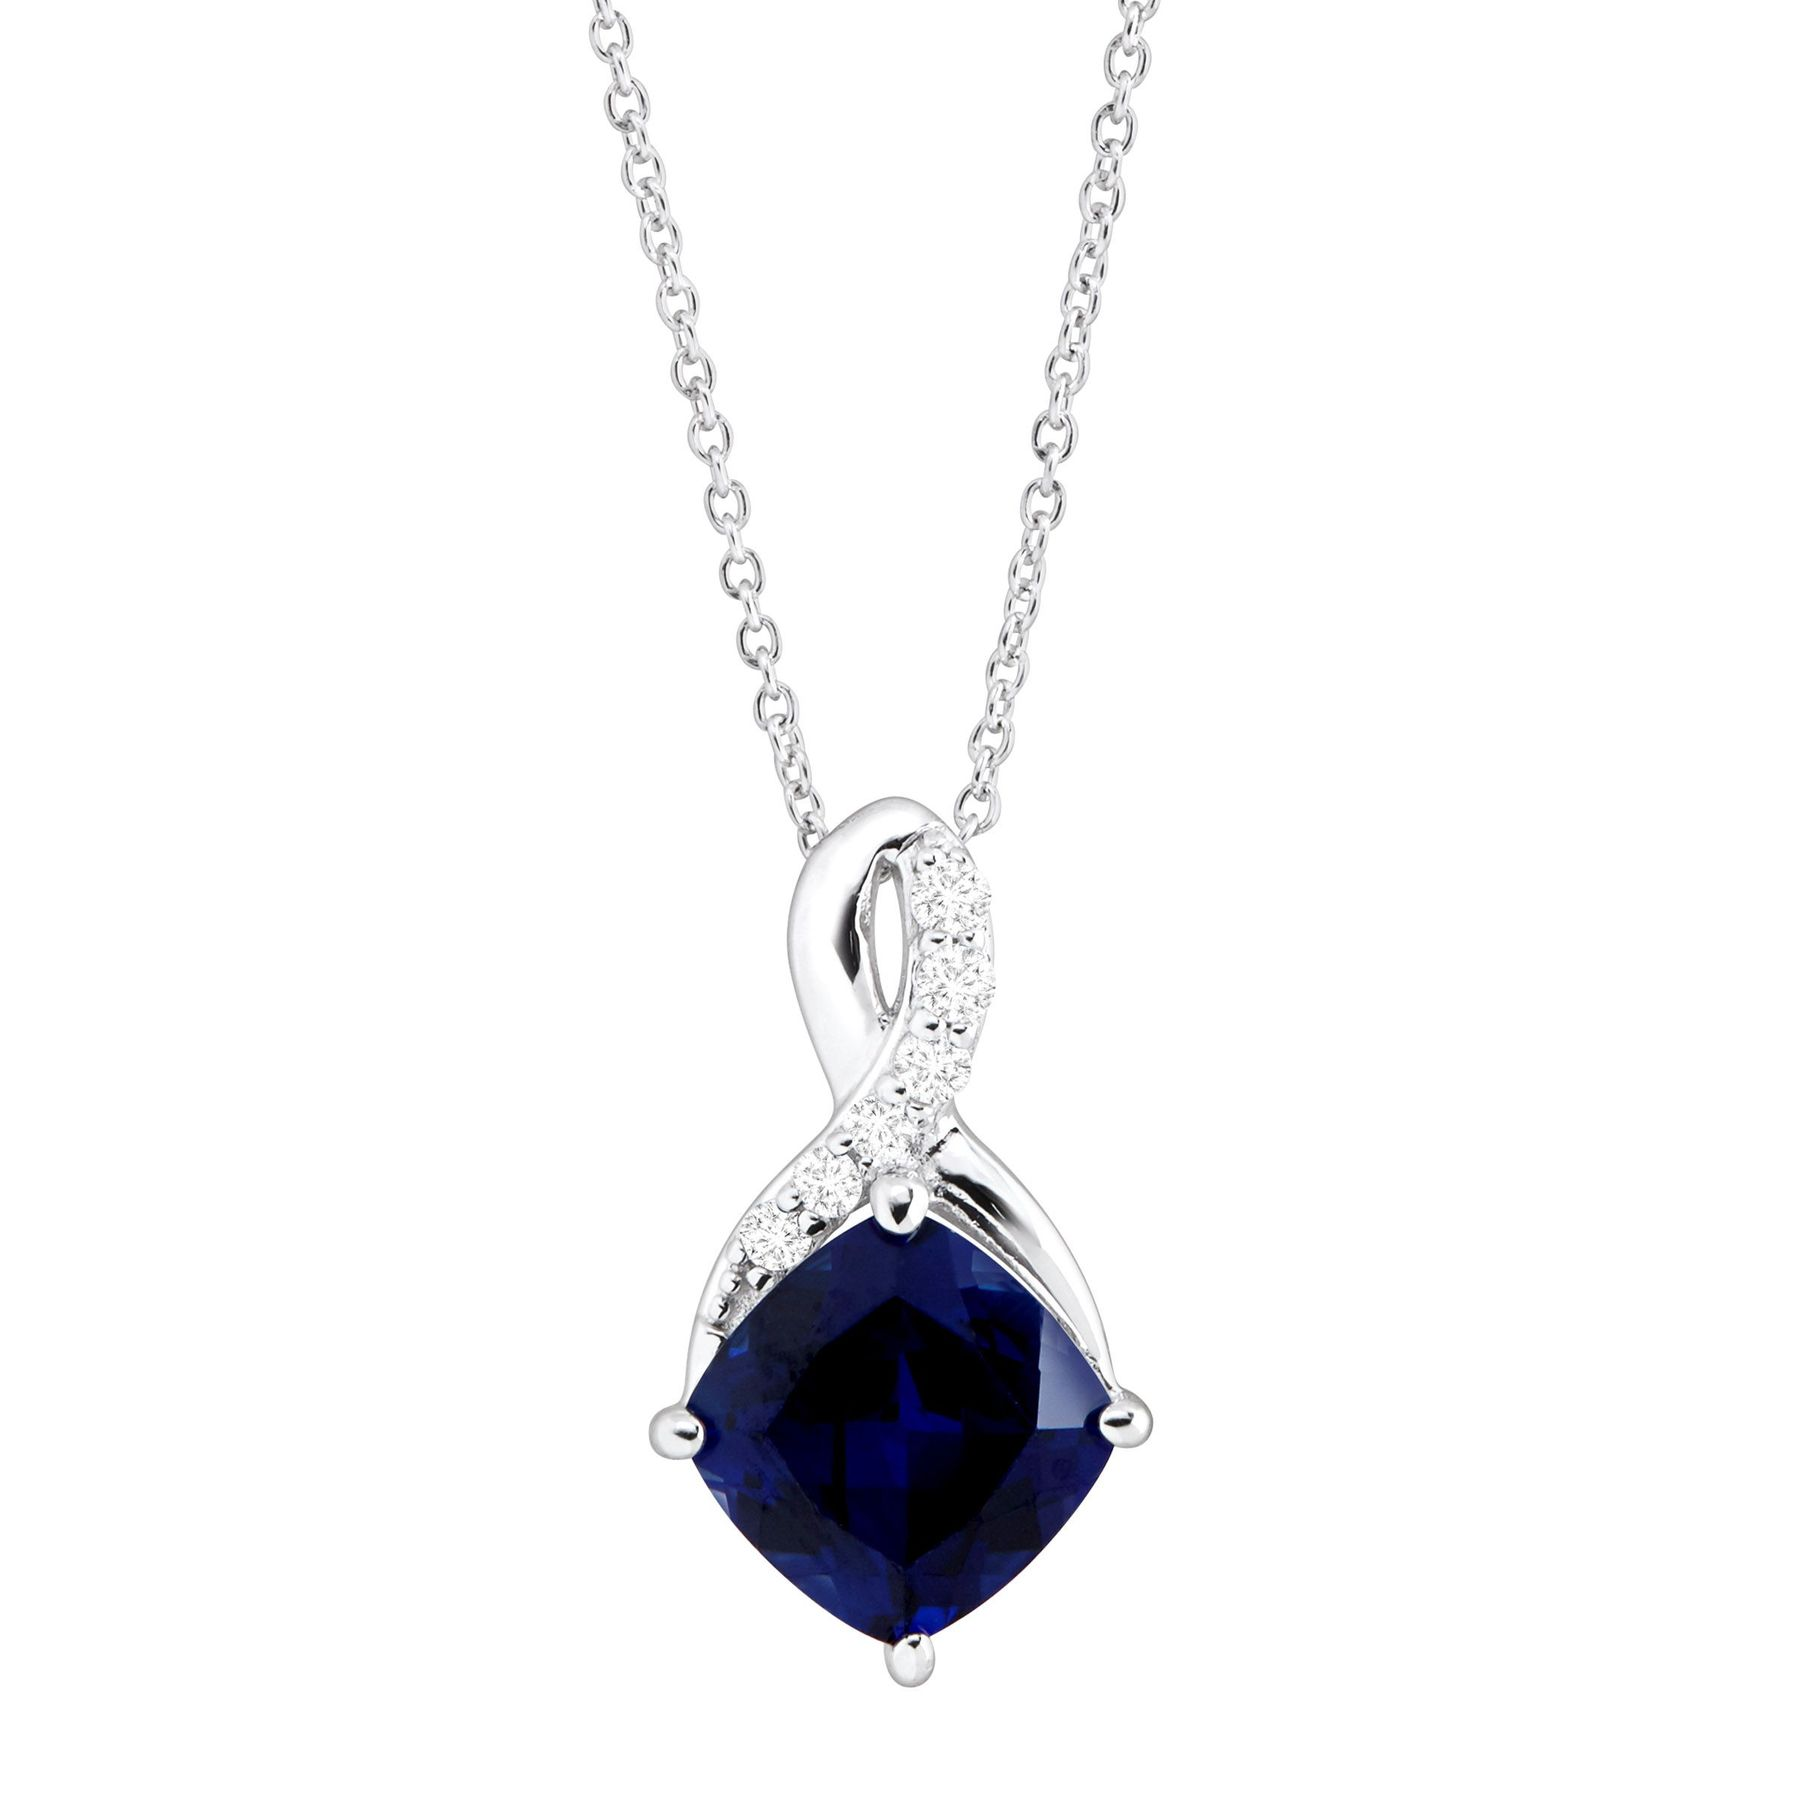 2 5/8 ct Created Sapphire & White Sapphire Pendant